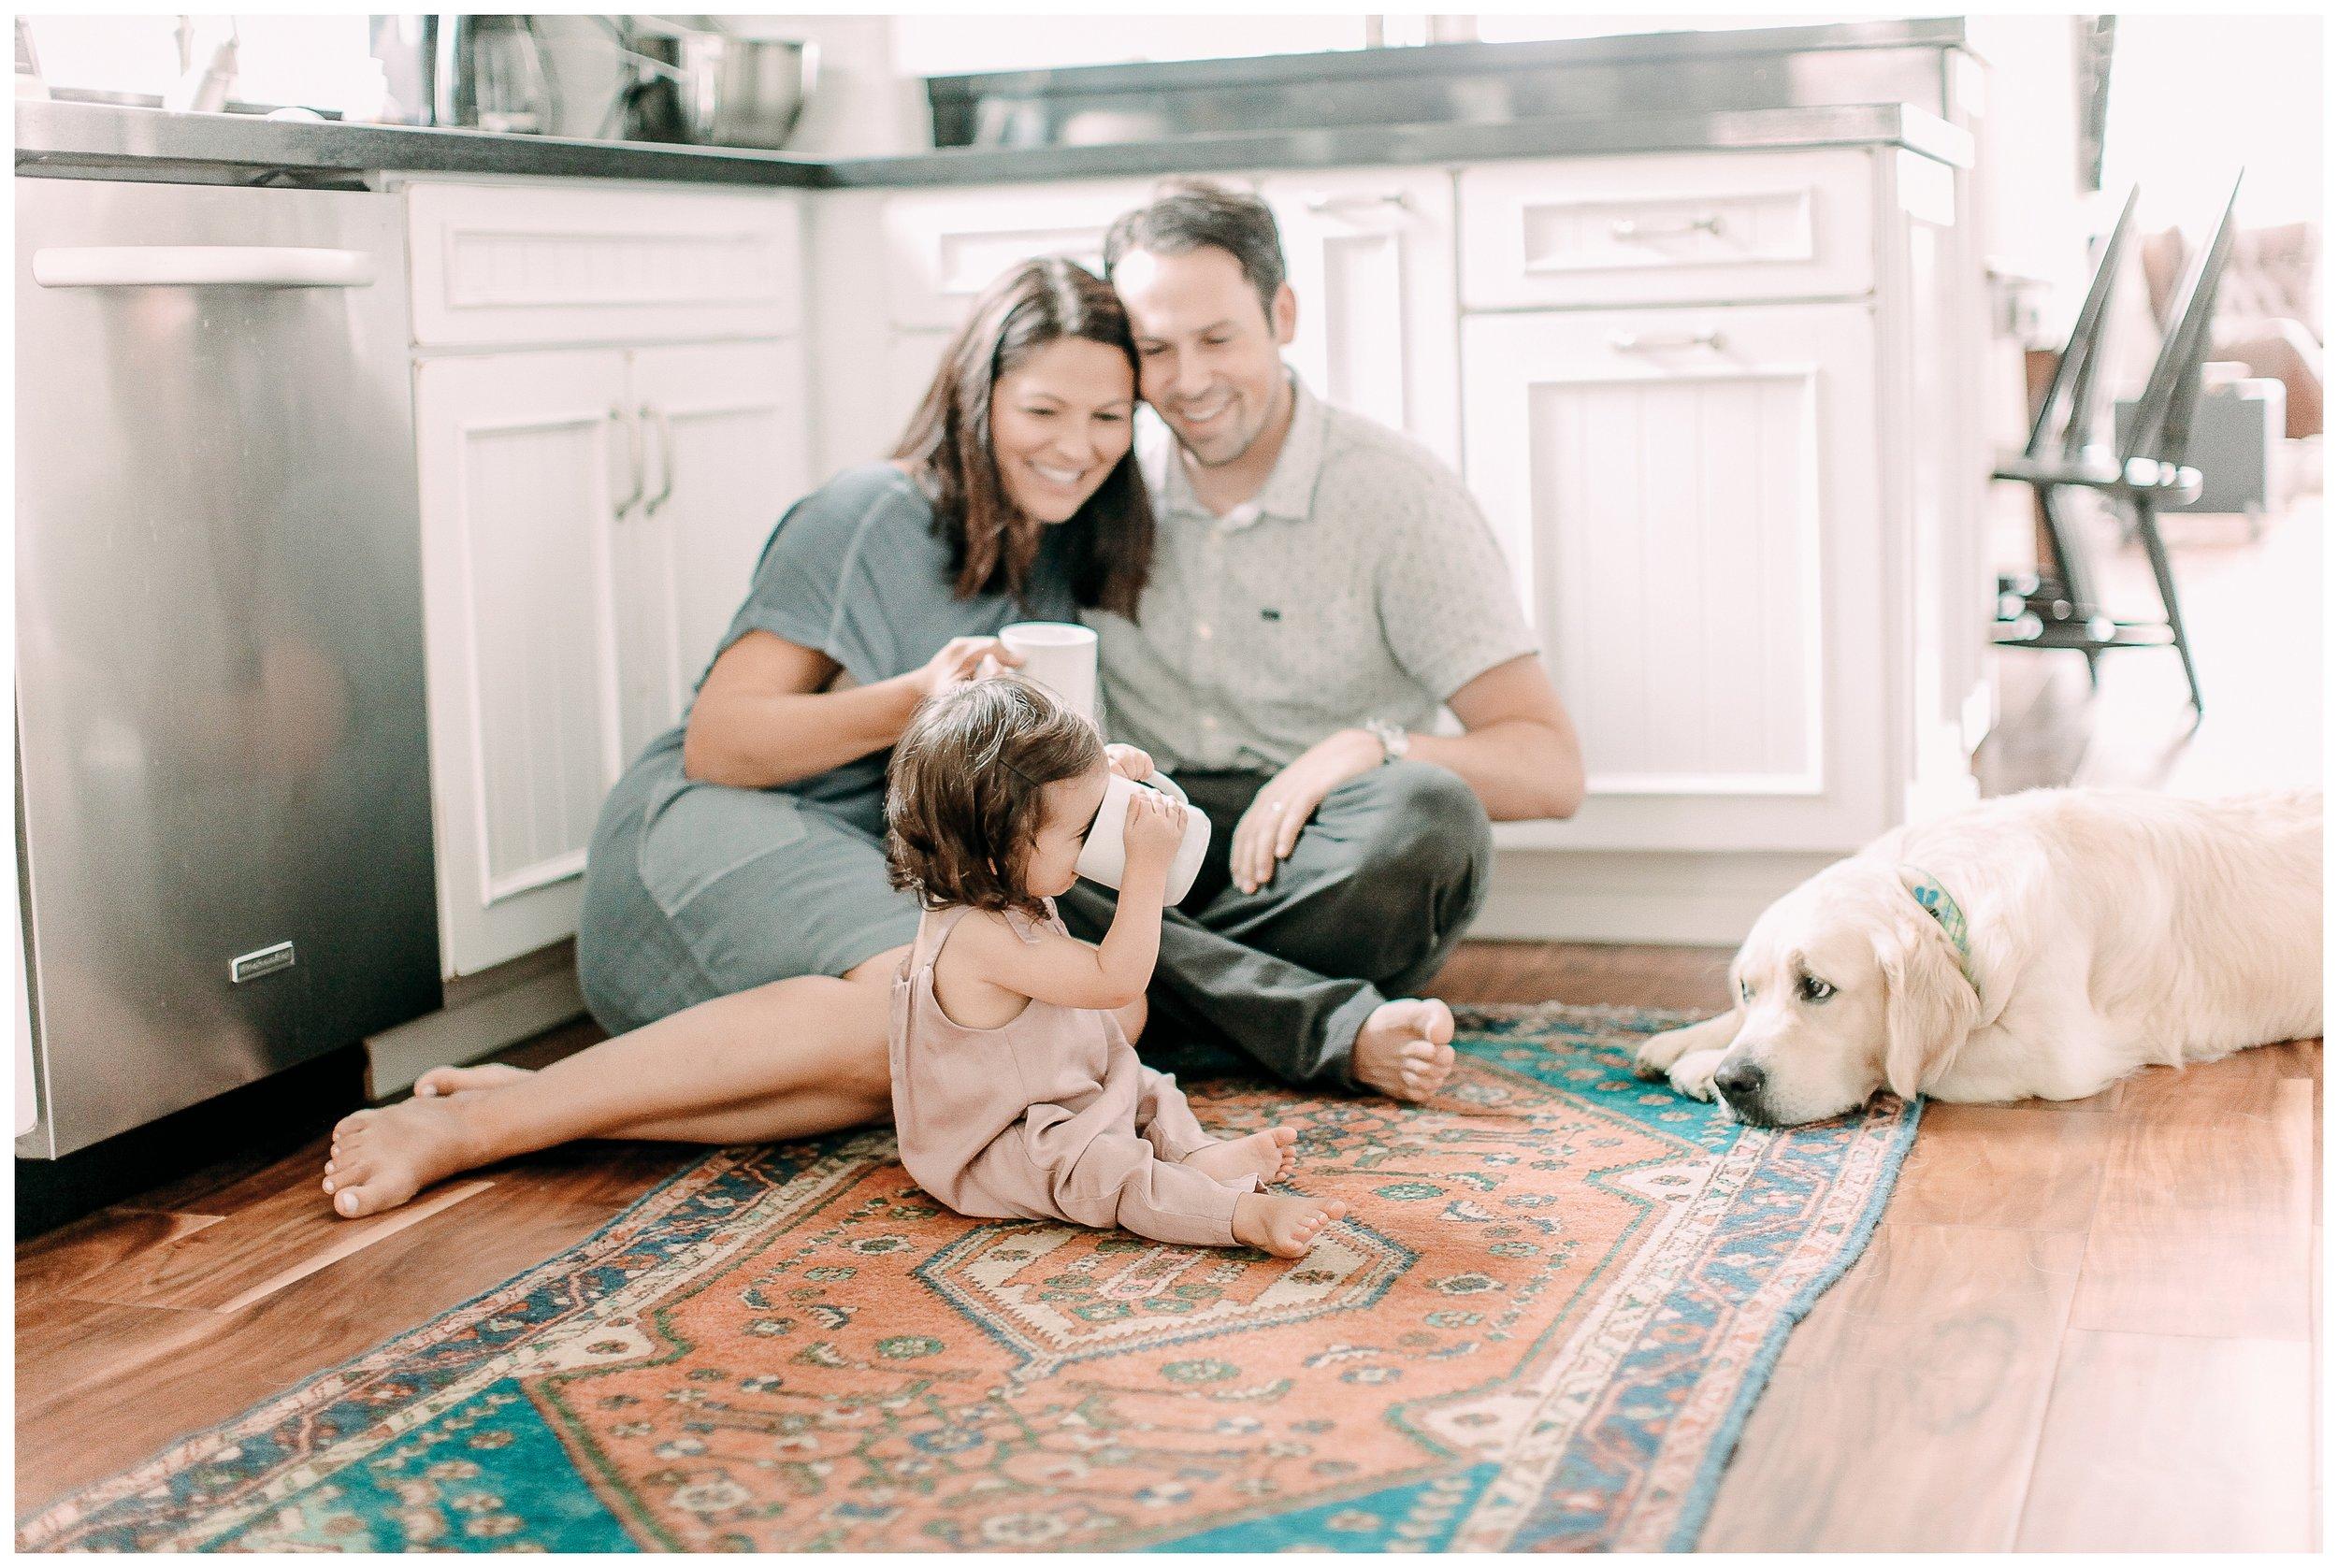 Orange_county_family_photographer_cori_kleckner_photography_0424.jpg